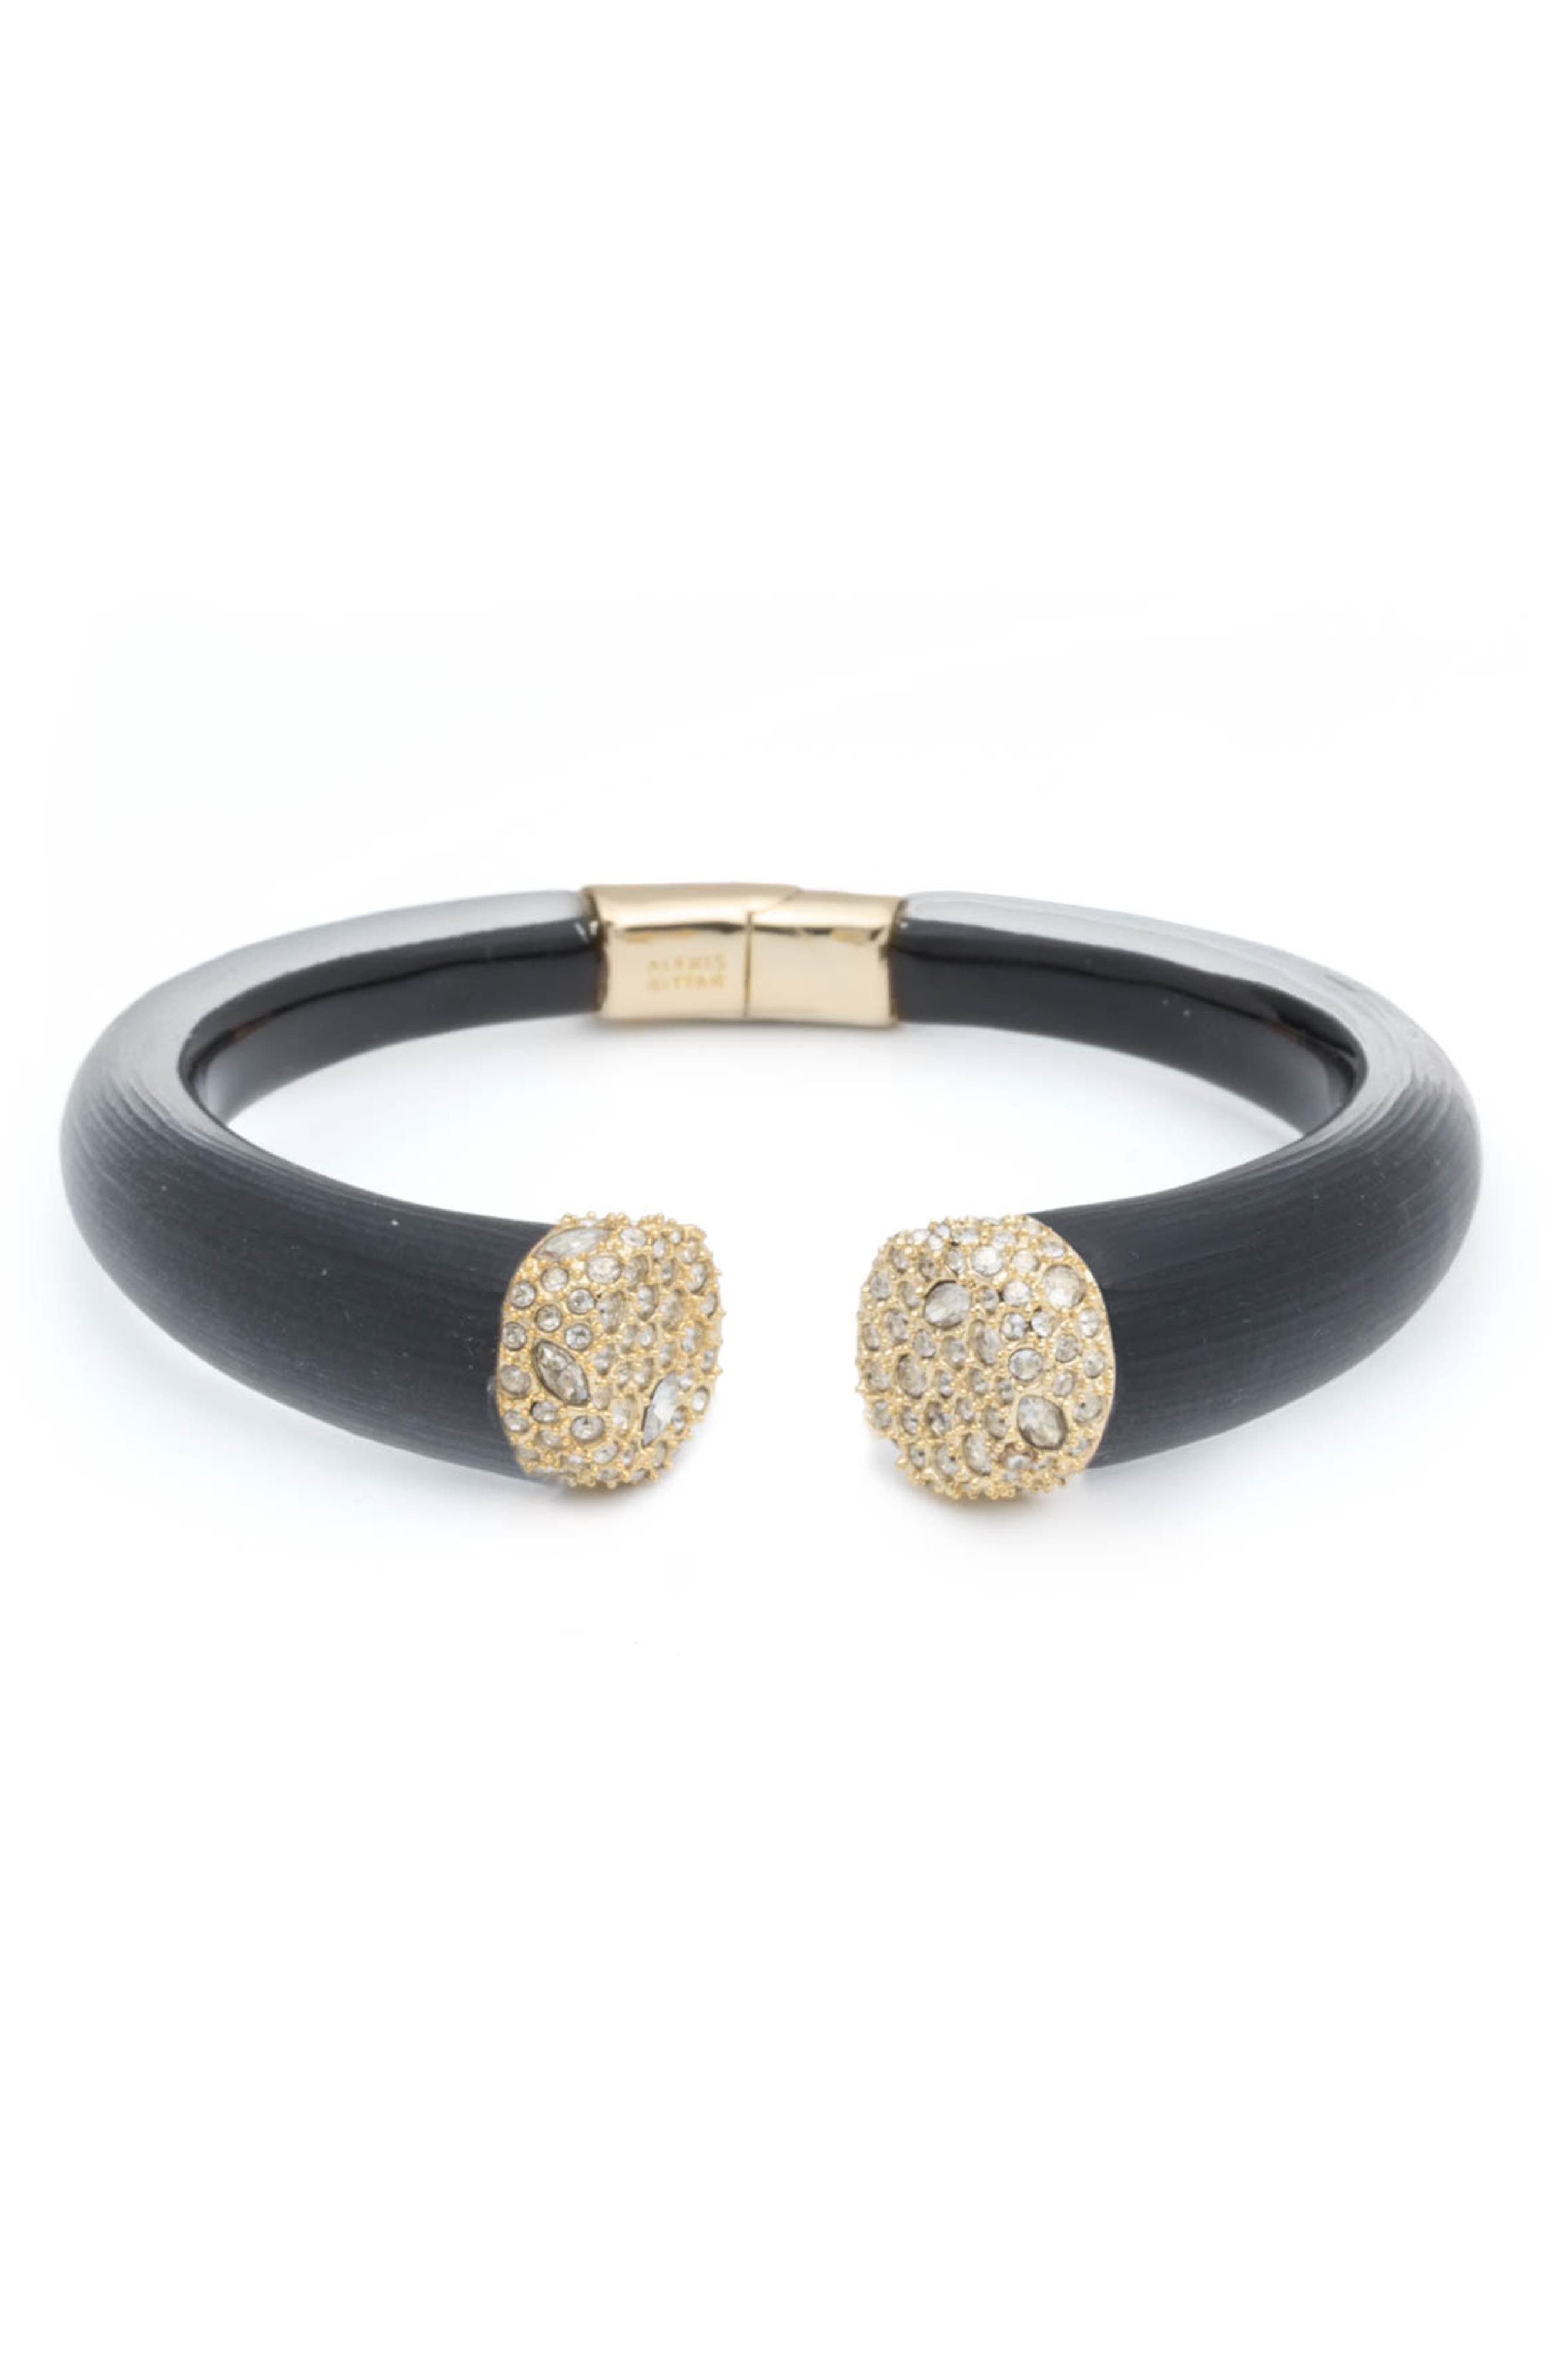 ALEXIS BITTAR Essentials Encrusted Pavé Hinged Bracelet, Main, color, BLACK